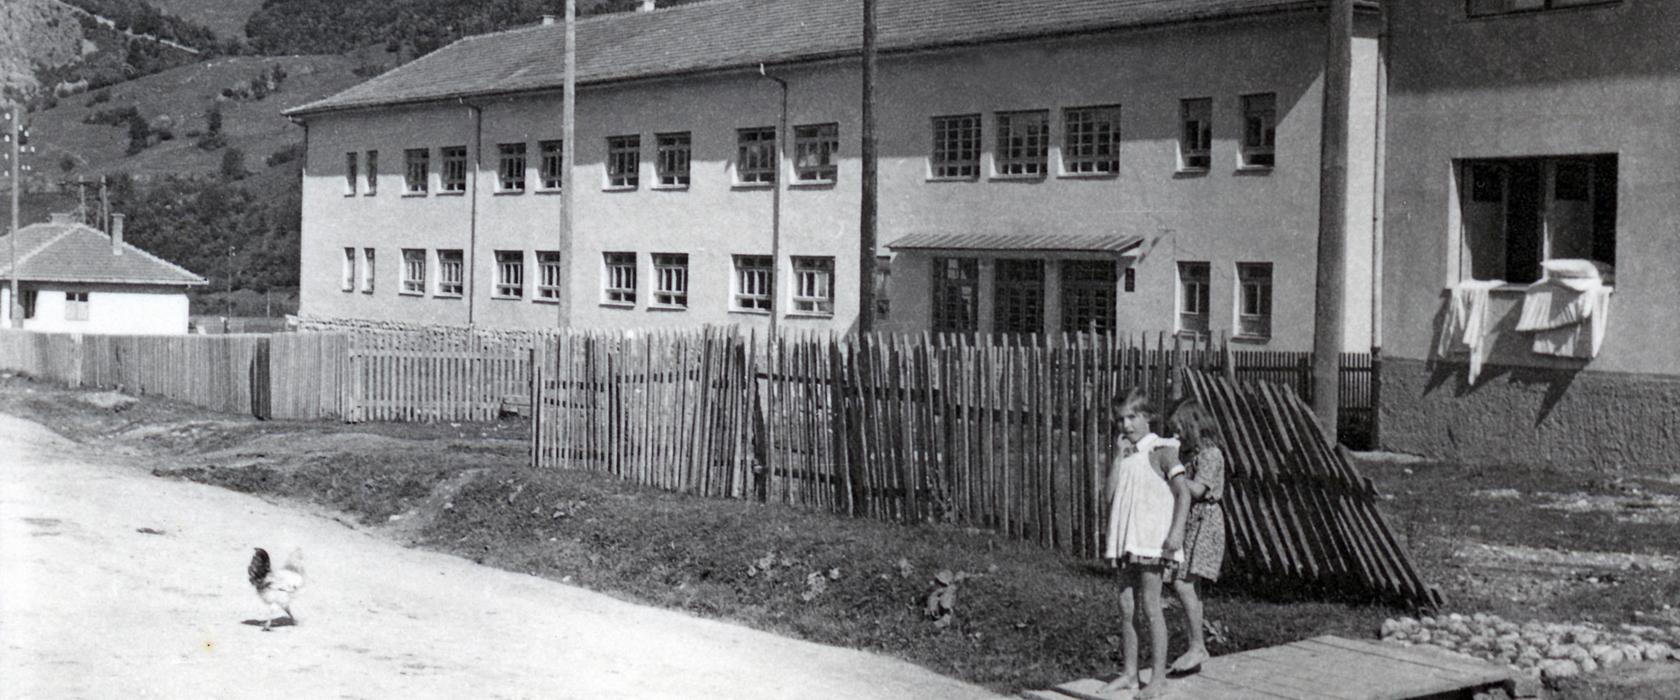 Škola u Trnovu, 1956.